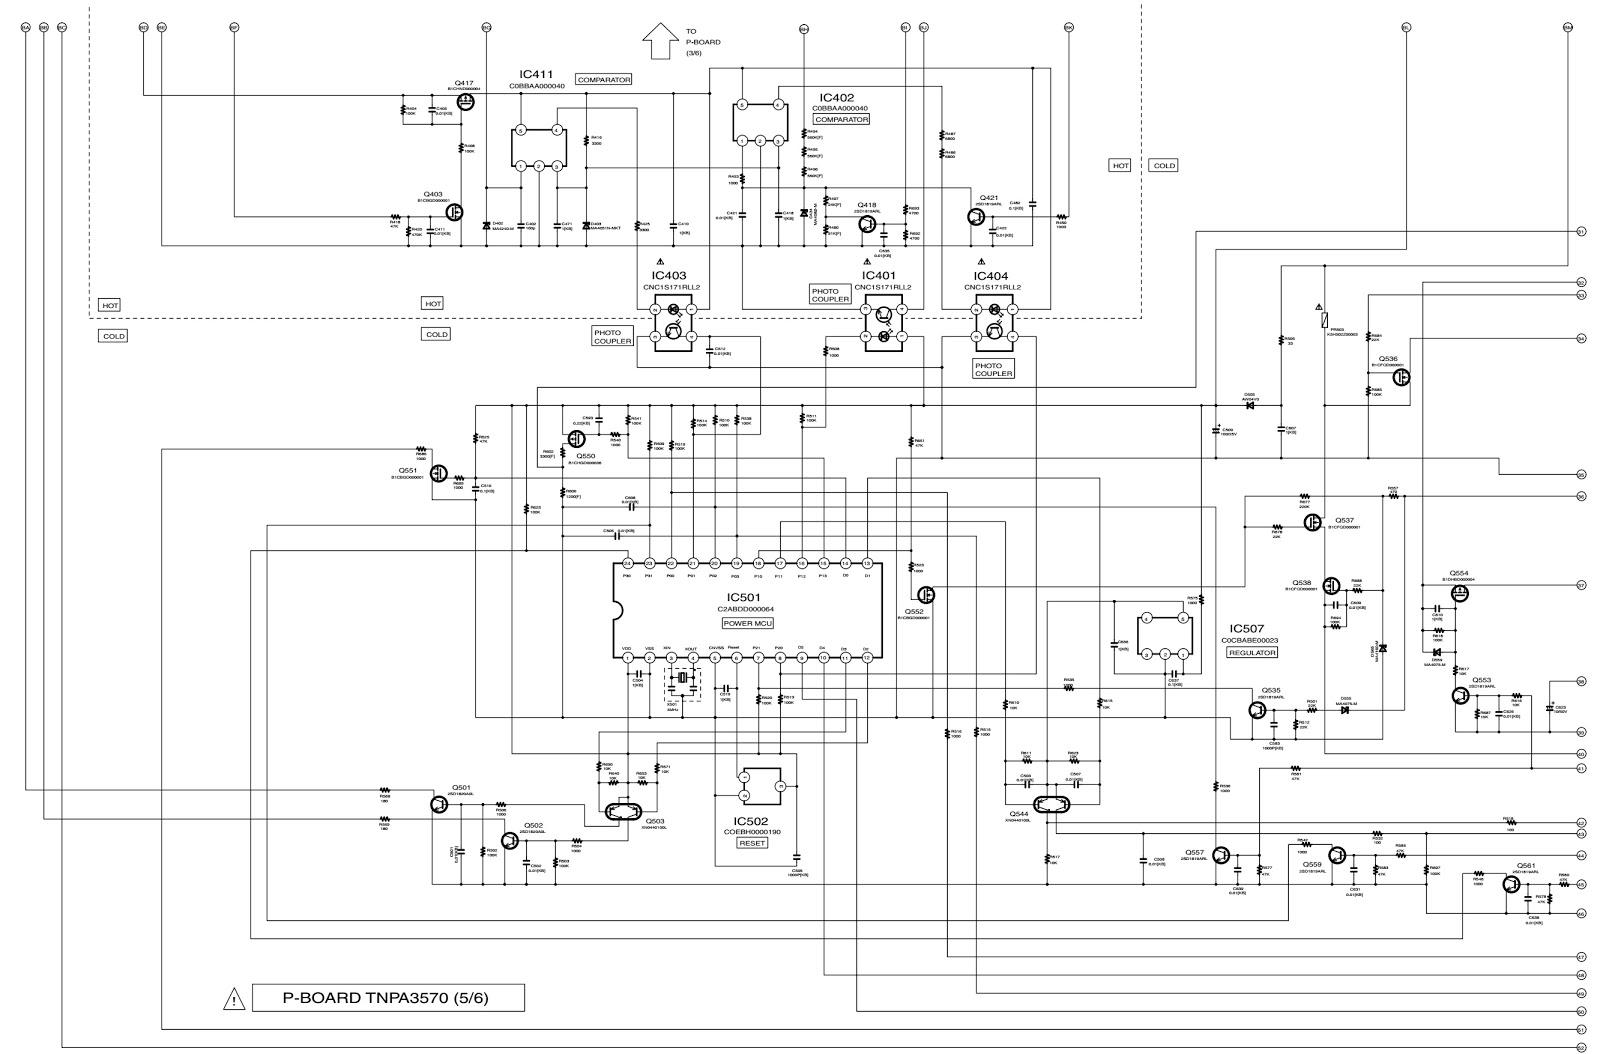 Hannspree Power Board Schematic Circuit Diagram on